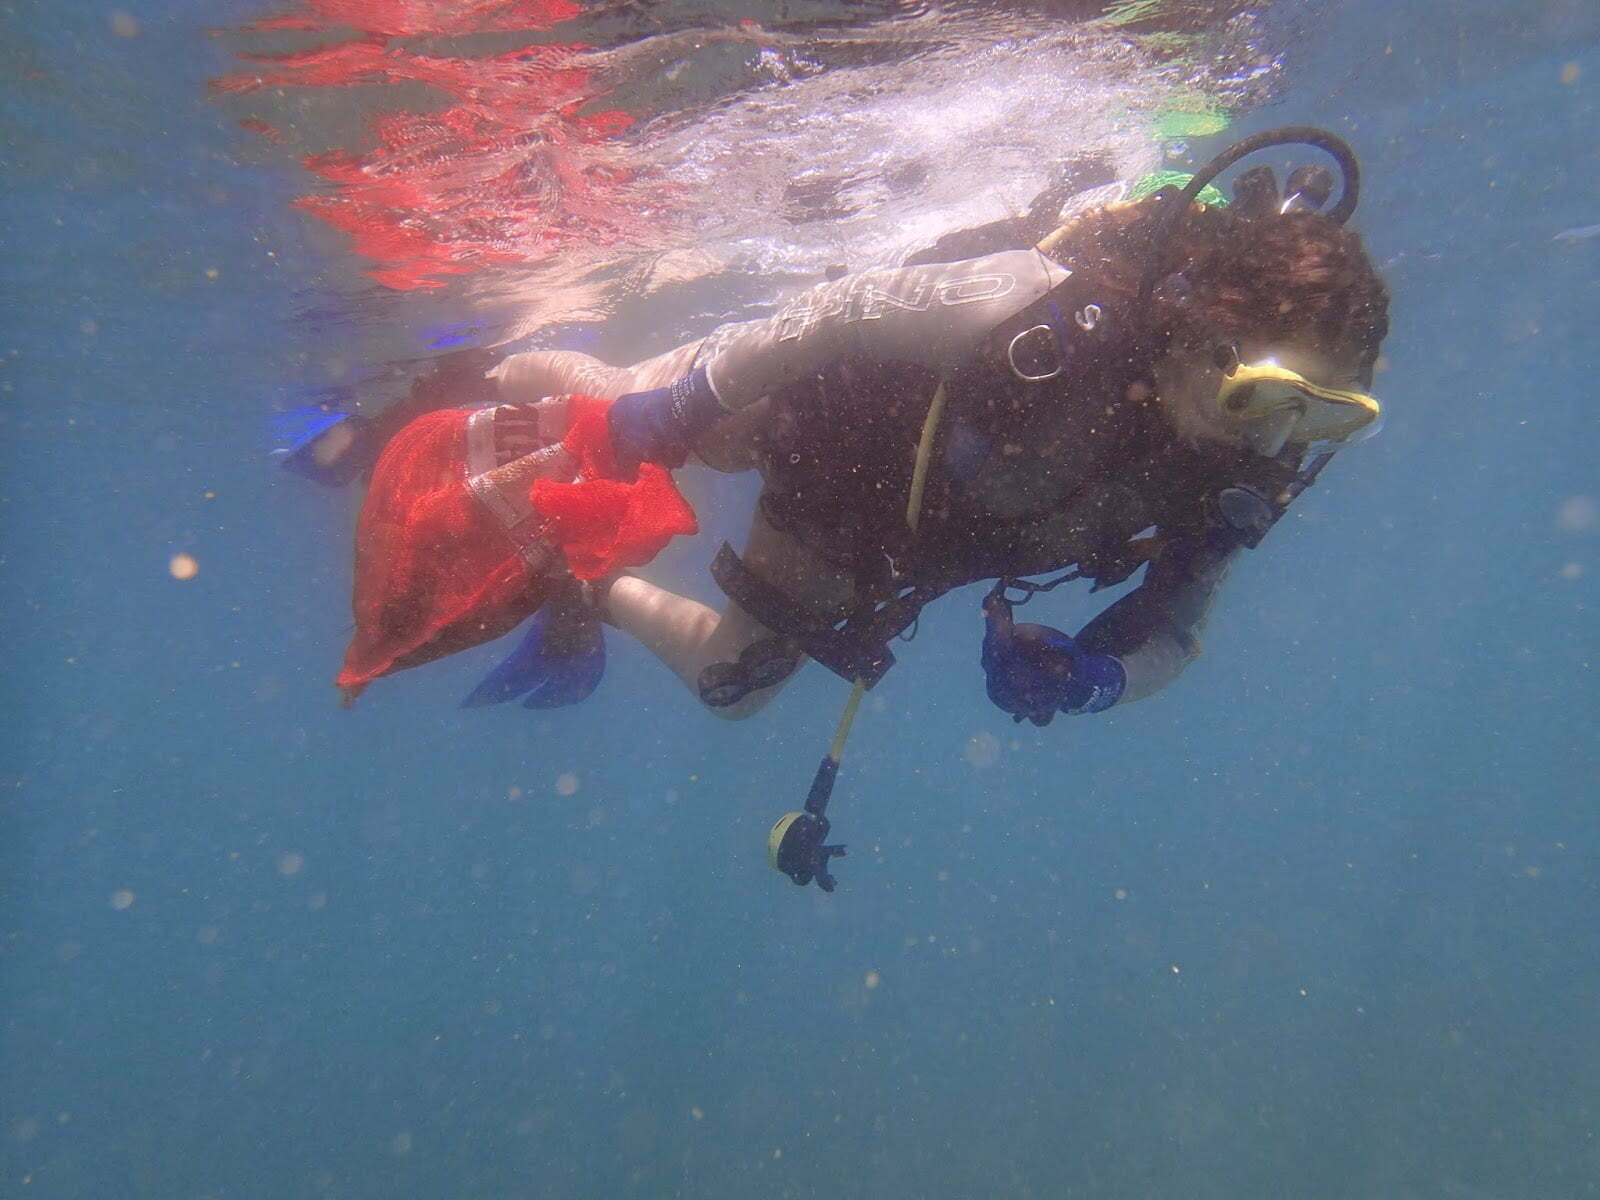 lixo no mar de salvador